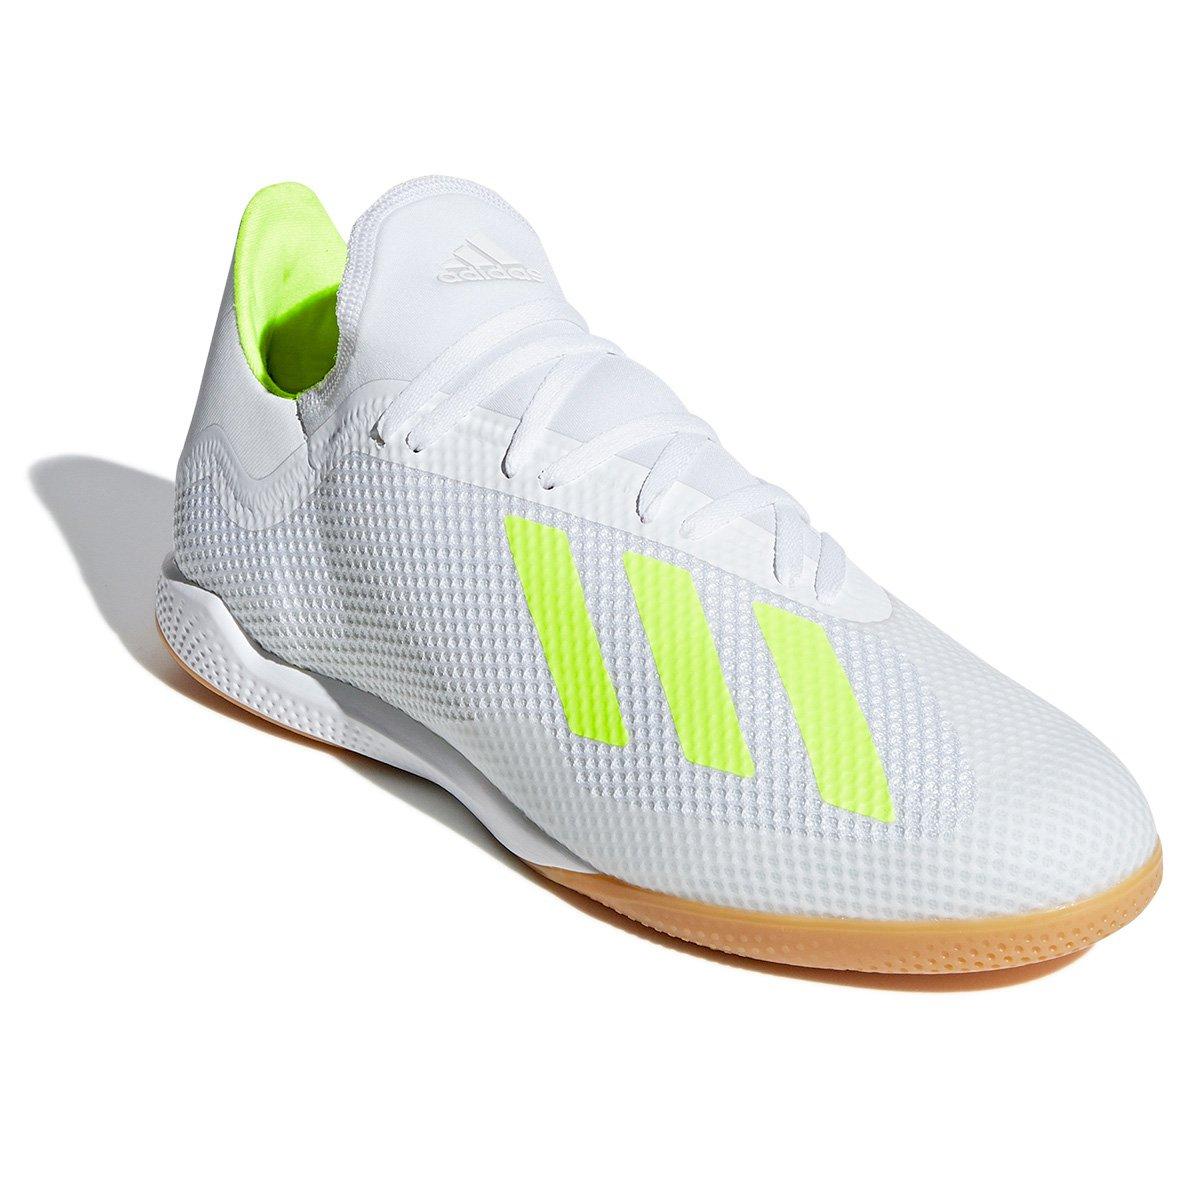 0642142a73a6c Chuteira Futsal Adidas X 18 3 IN - Branco e Amarelo | São Paulo Mania